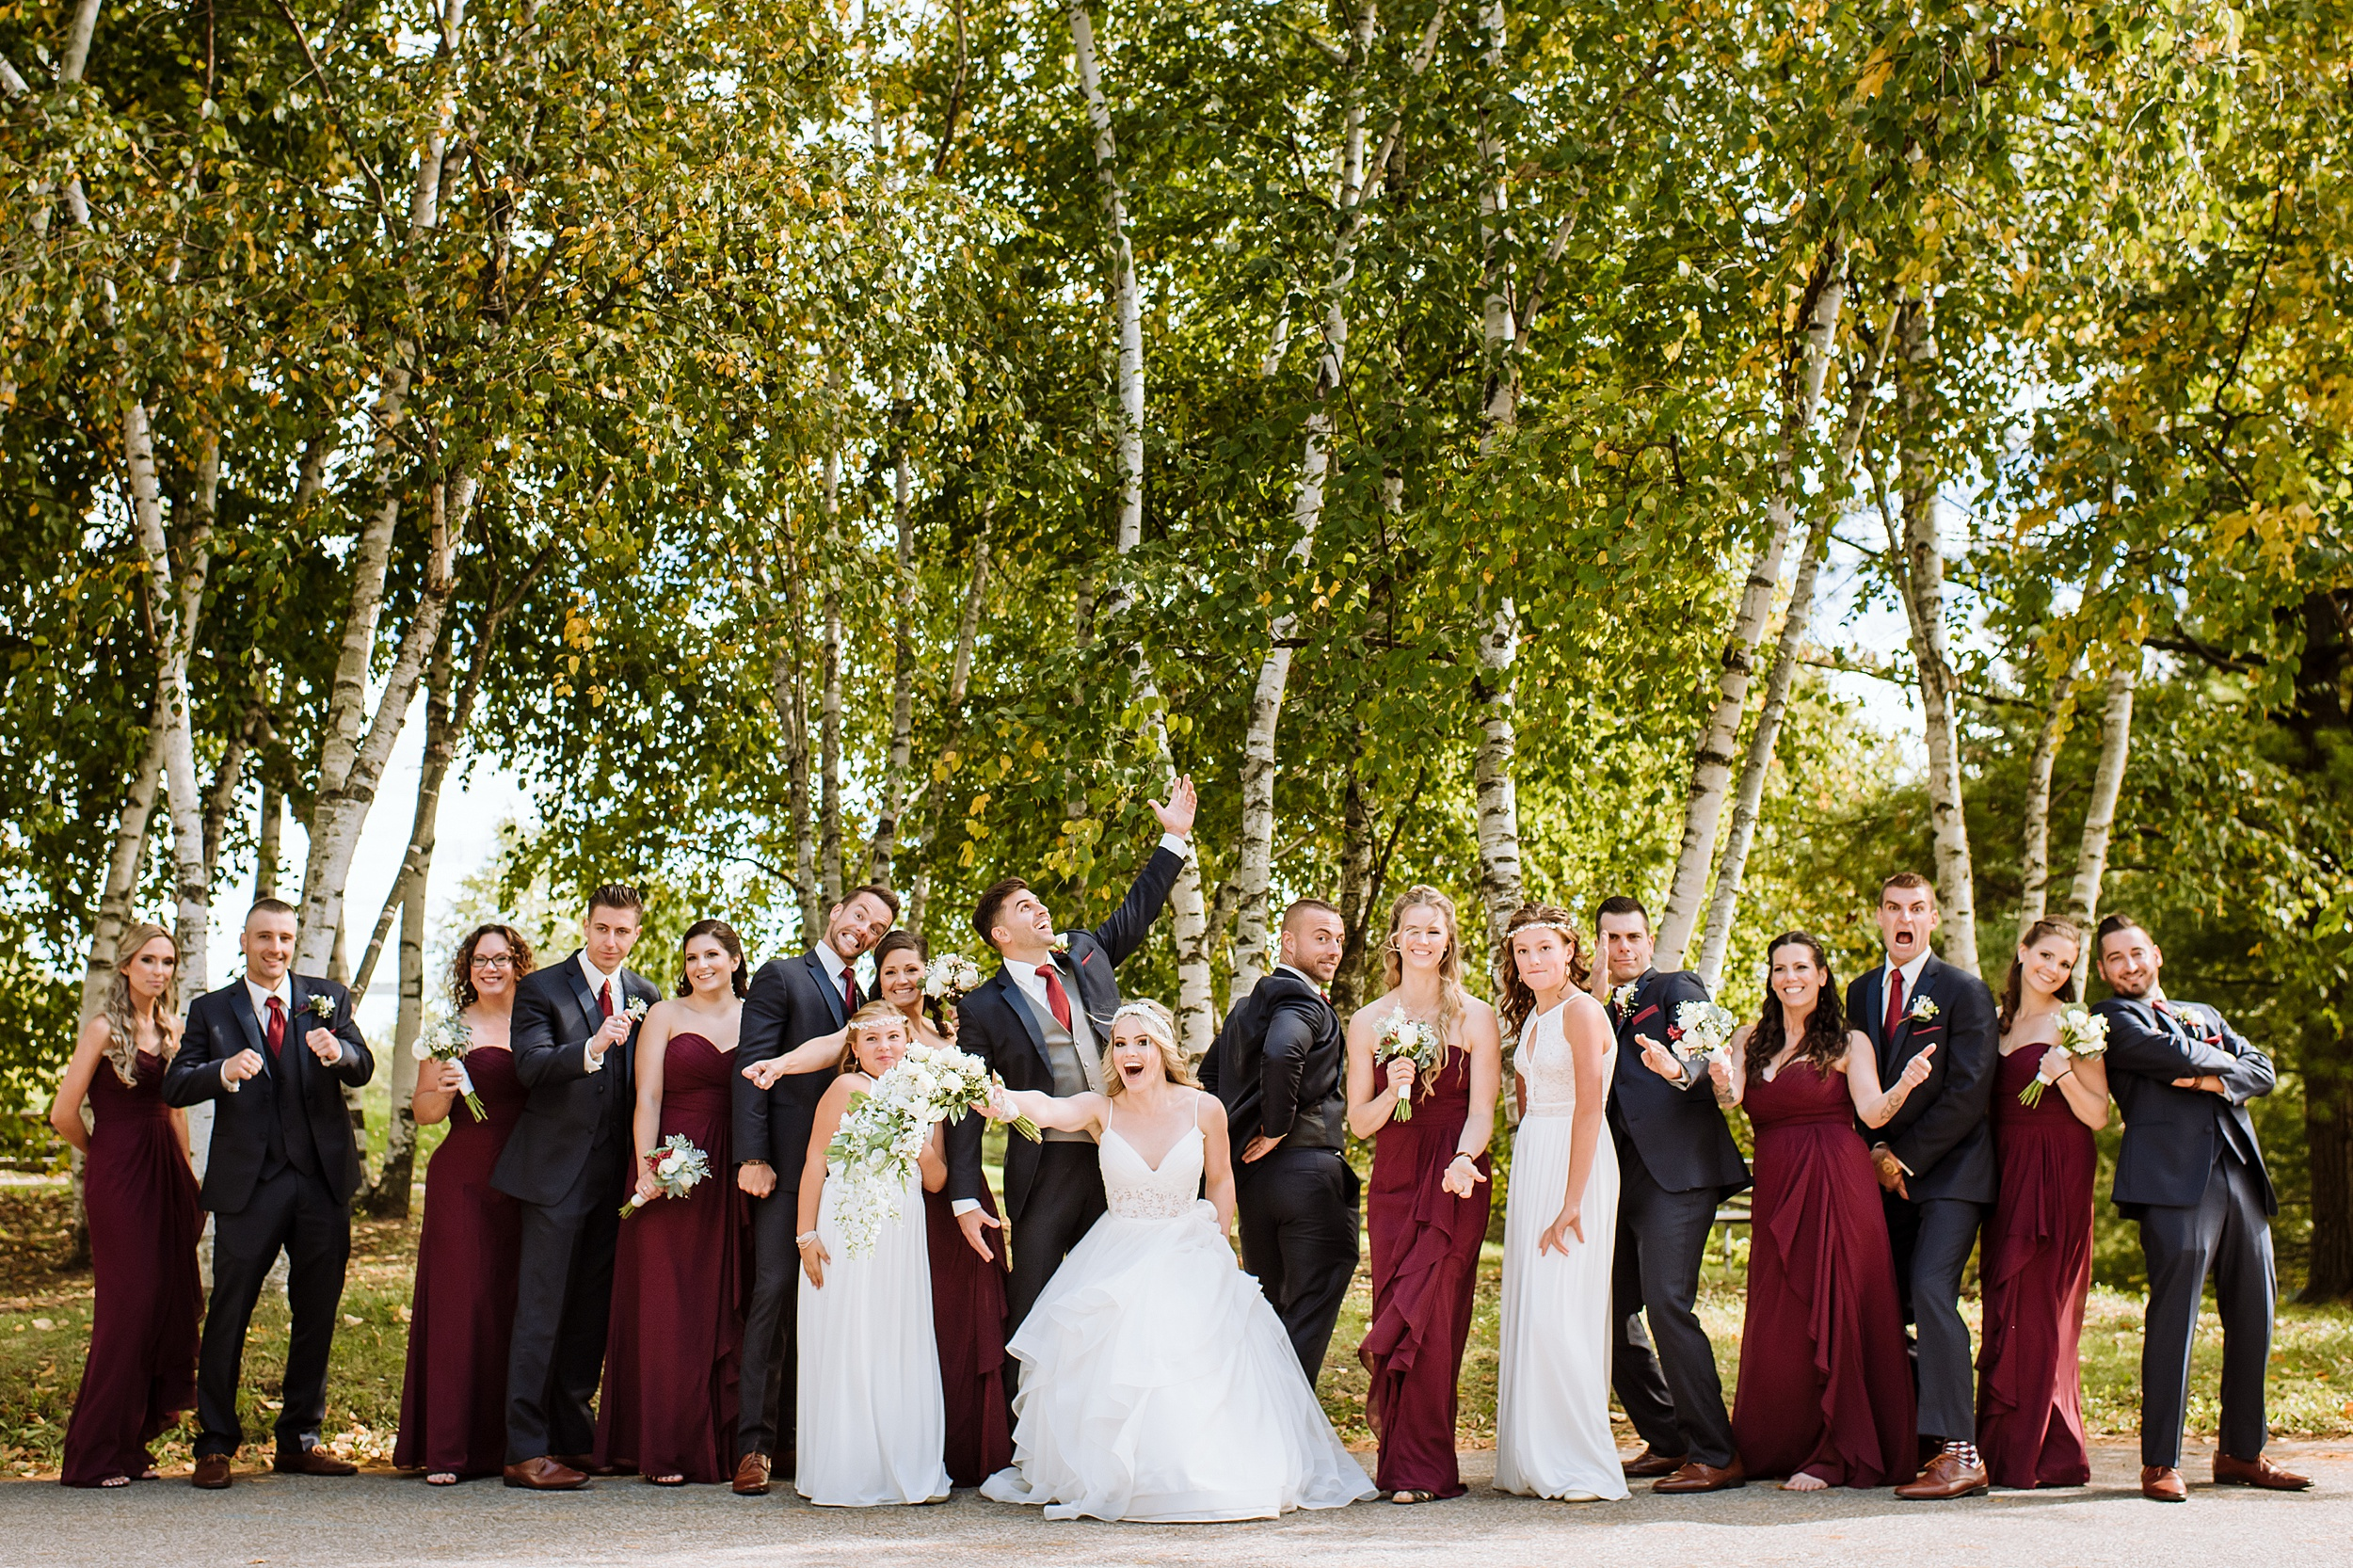 McMichael_Art_Collection_Wedding_chateau_le_jardin_Justine_Munro_Toronto_Photographer033.jpg